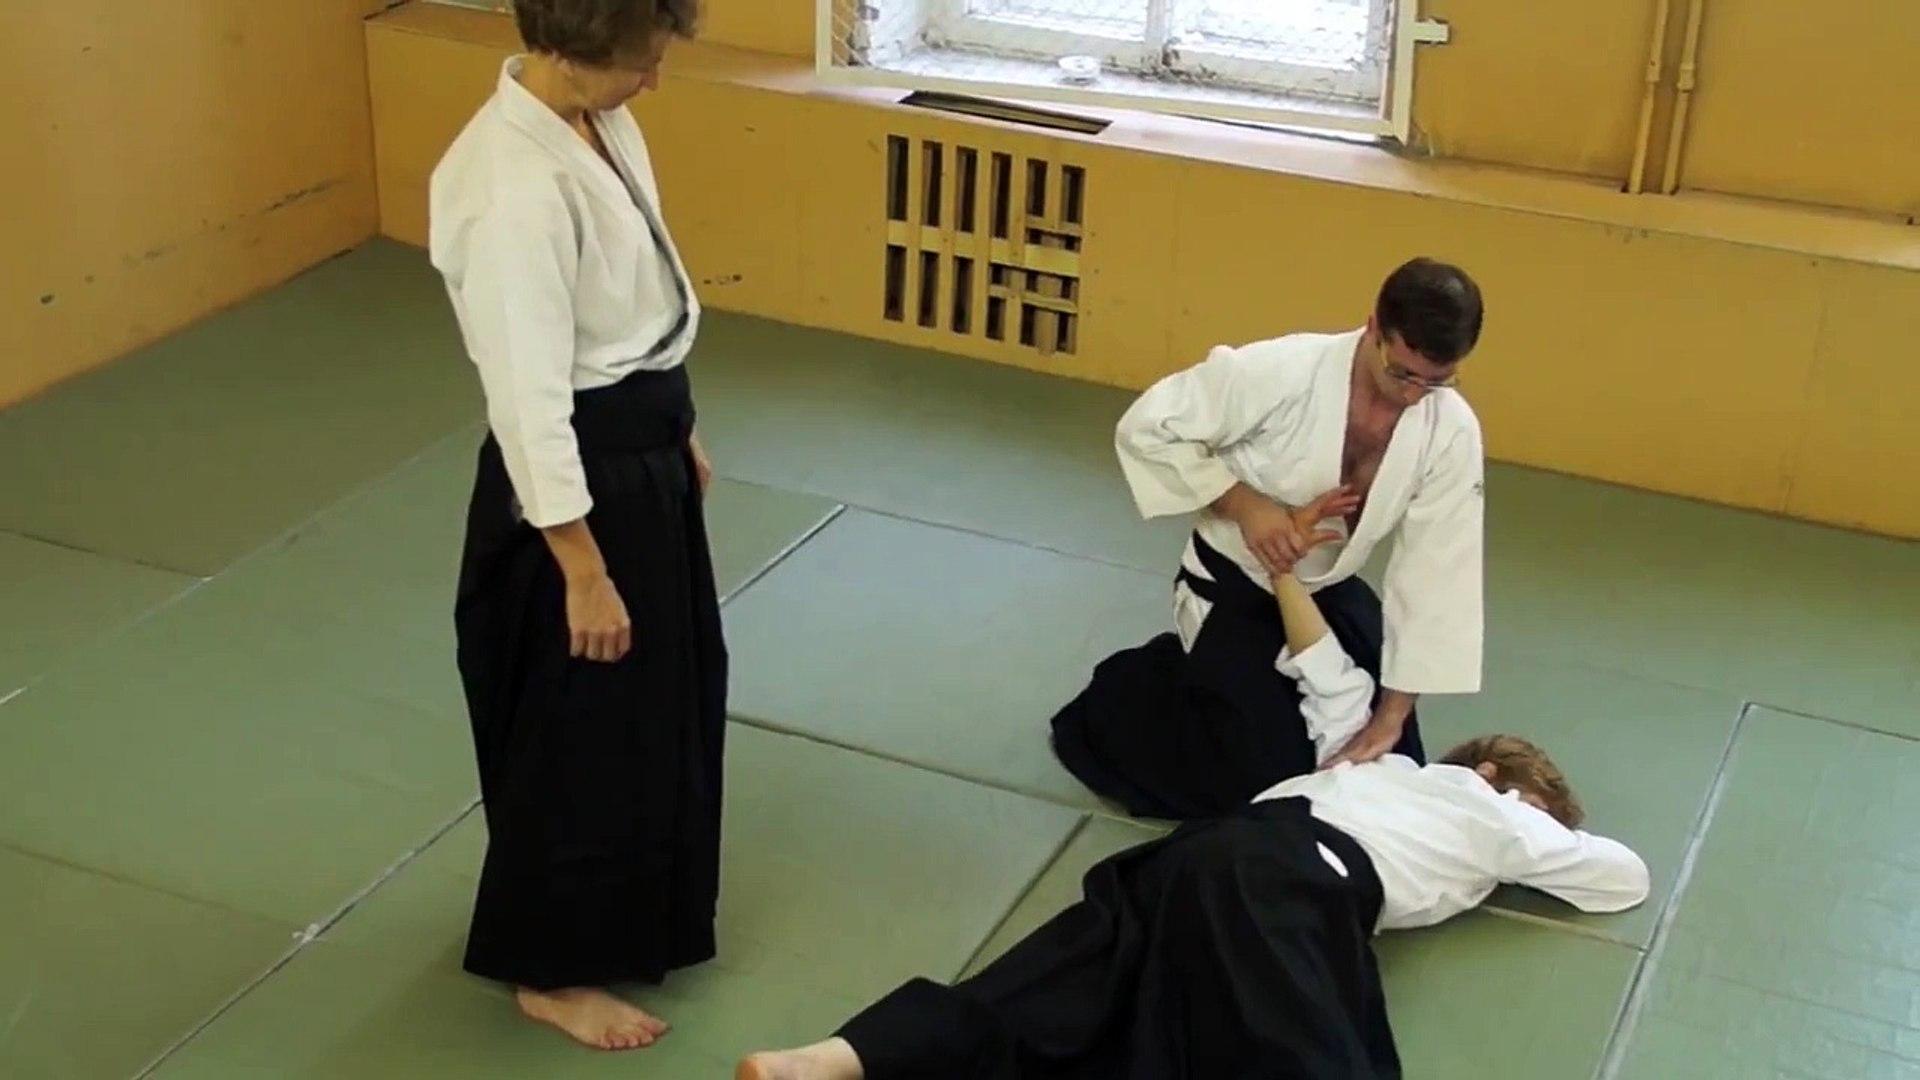 Self defense, Айкидо, тренировки,  спб, female aikido, training, 05.08.2015